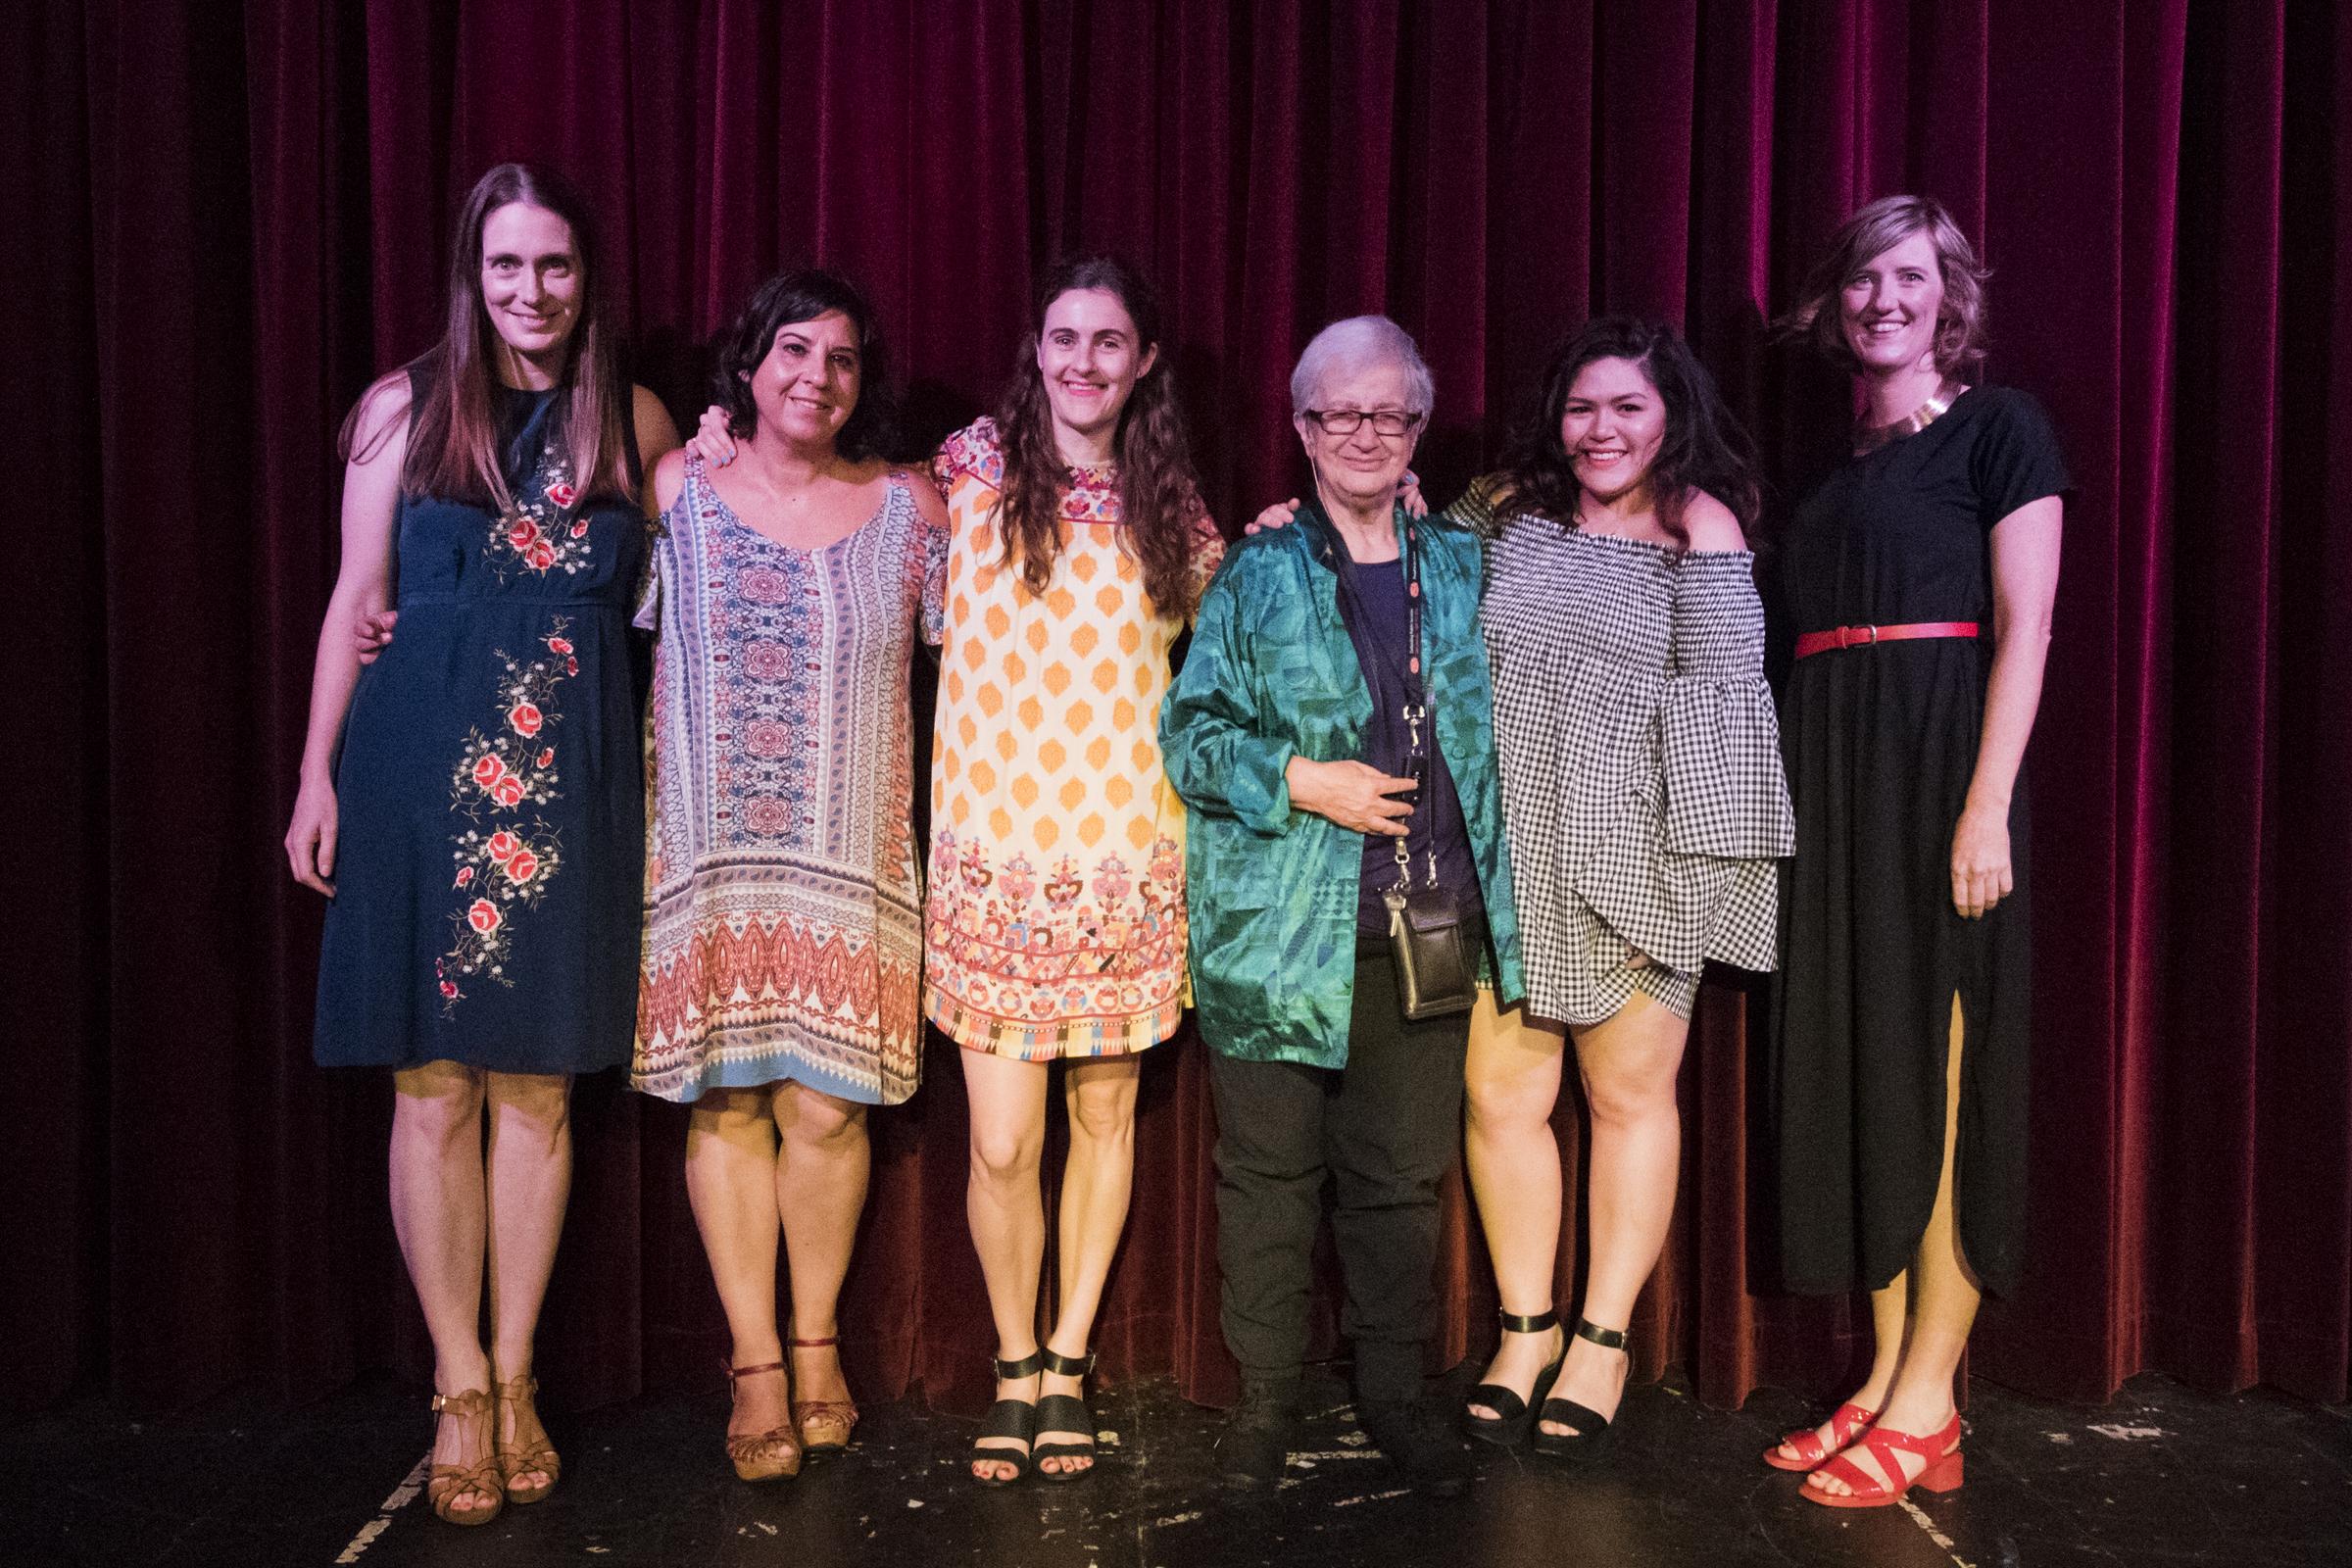 GenerationWomen-GiantDwarfTheatre-Dec17-SimoneFisher-2.jpg